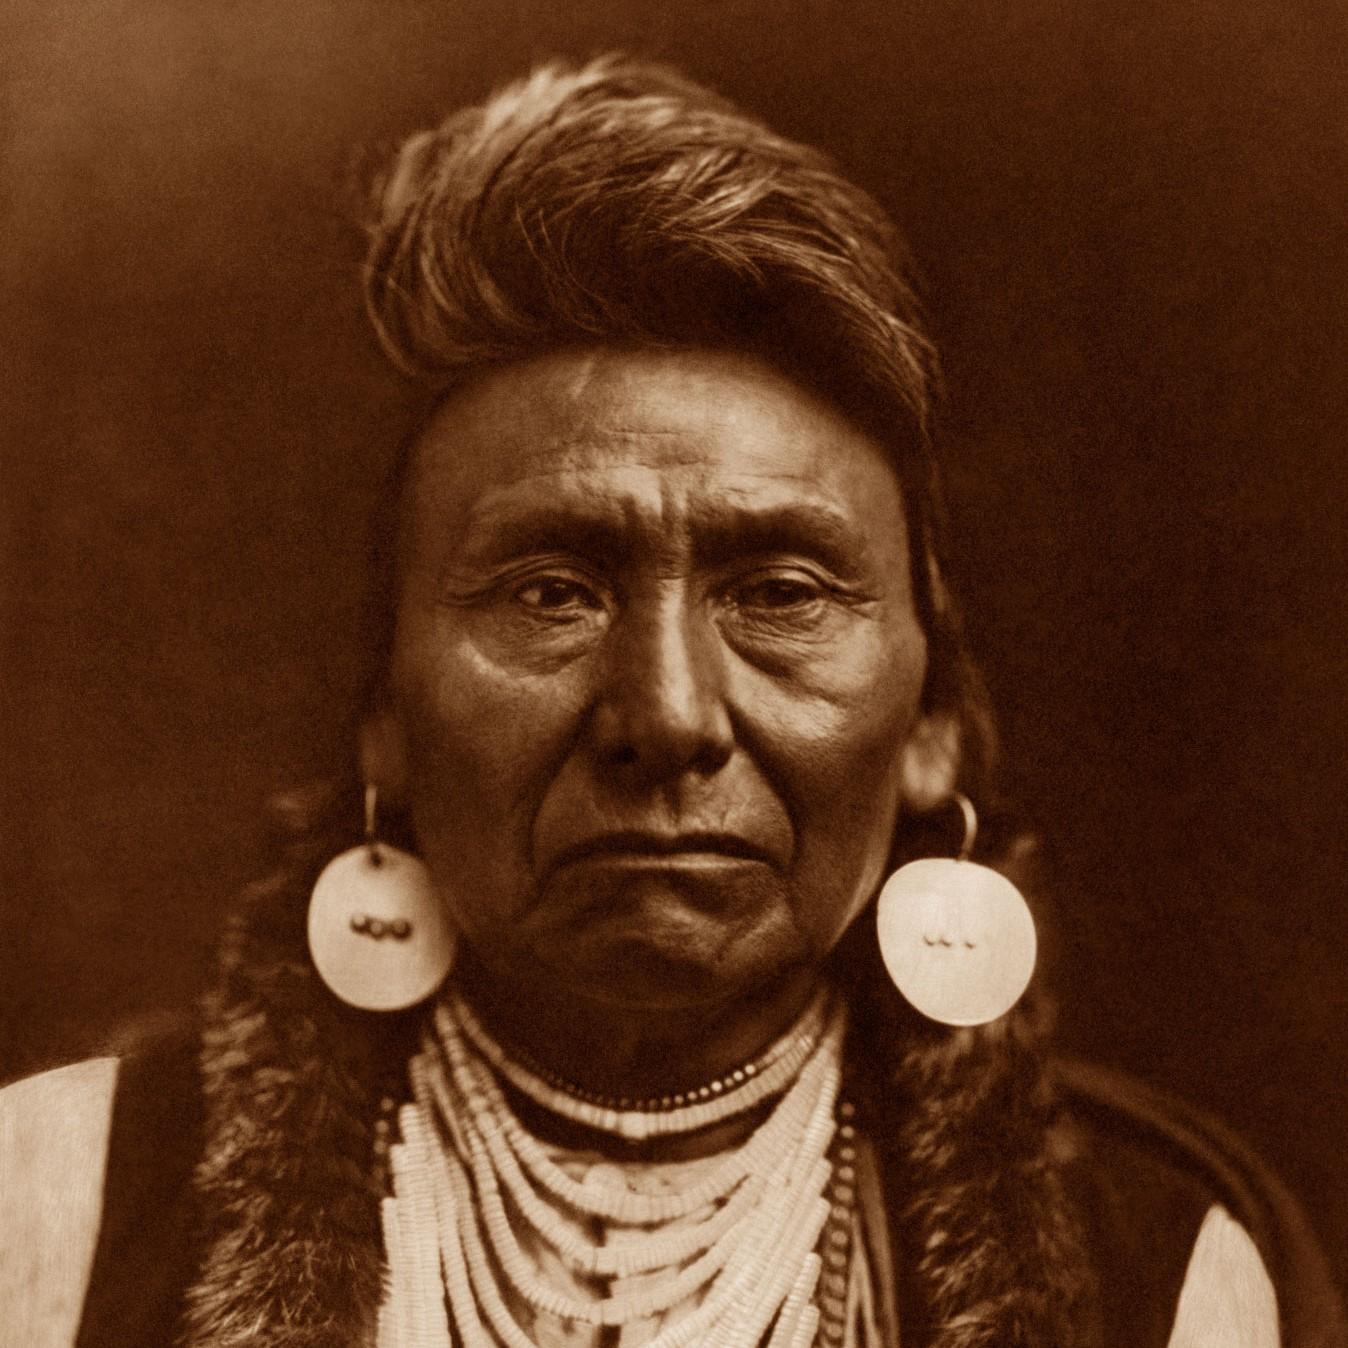 52 - Chief Joseph & the Nez Perce War